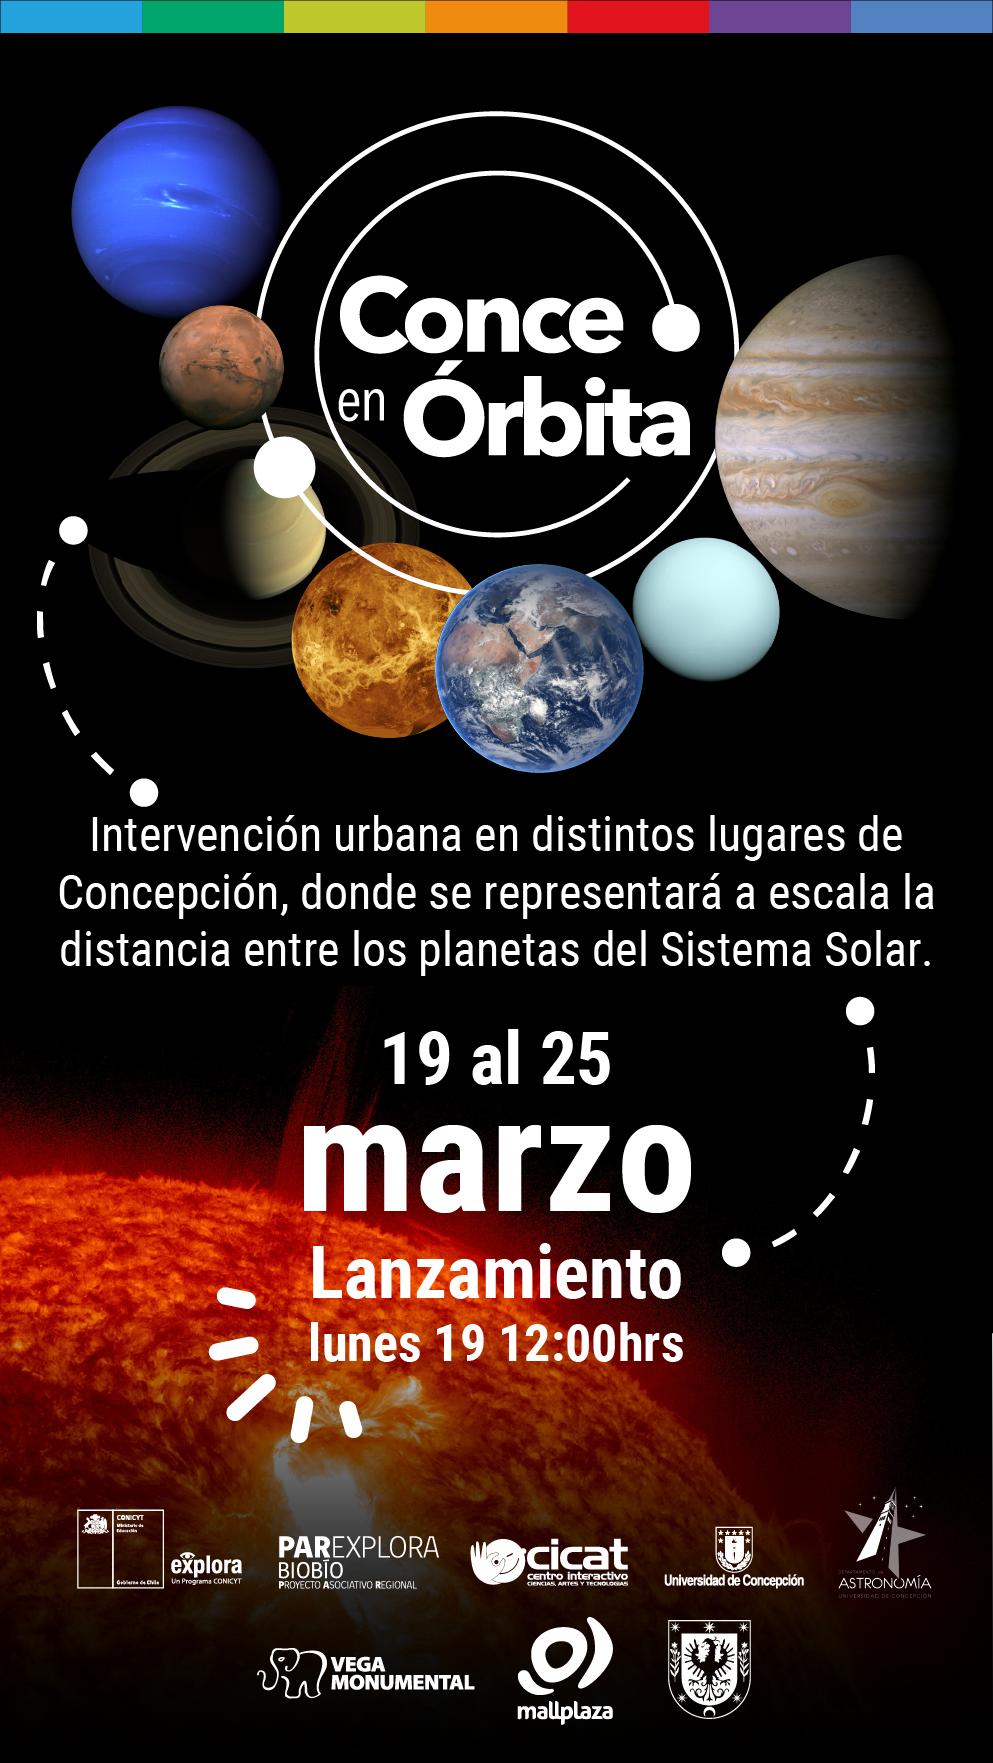 Conce en Órbita-02 (3).png